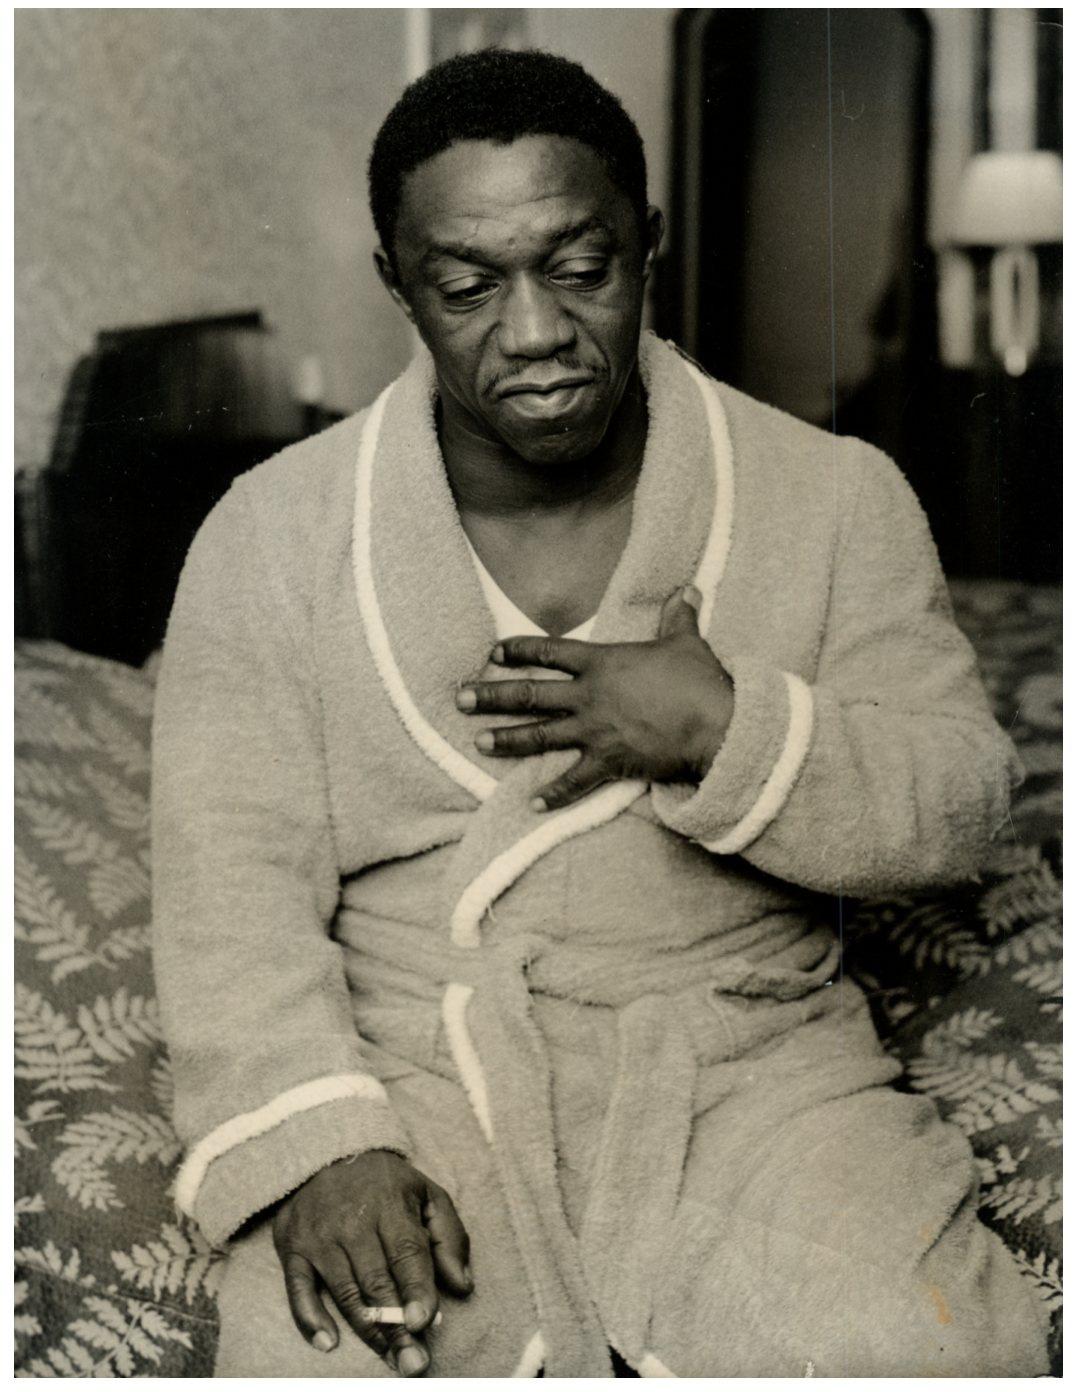 Sugar Ray Robinson Photographie originale / Original photograph